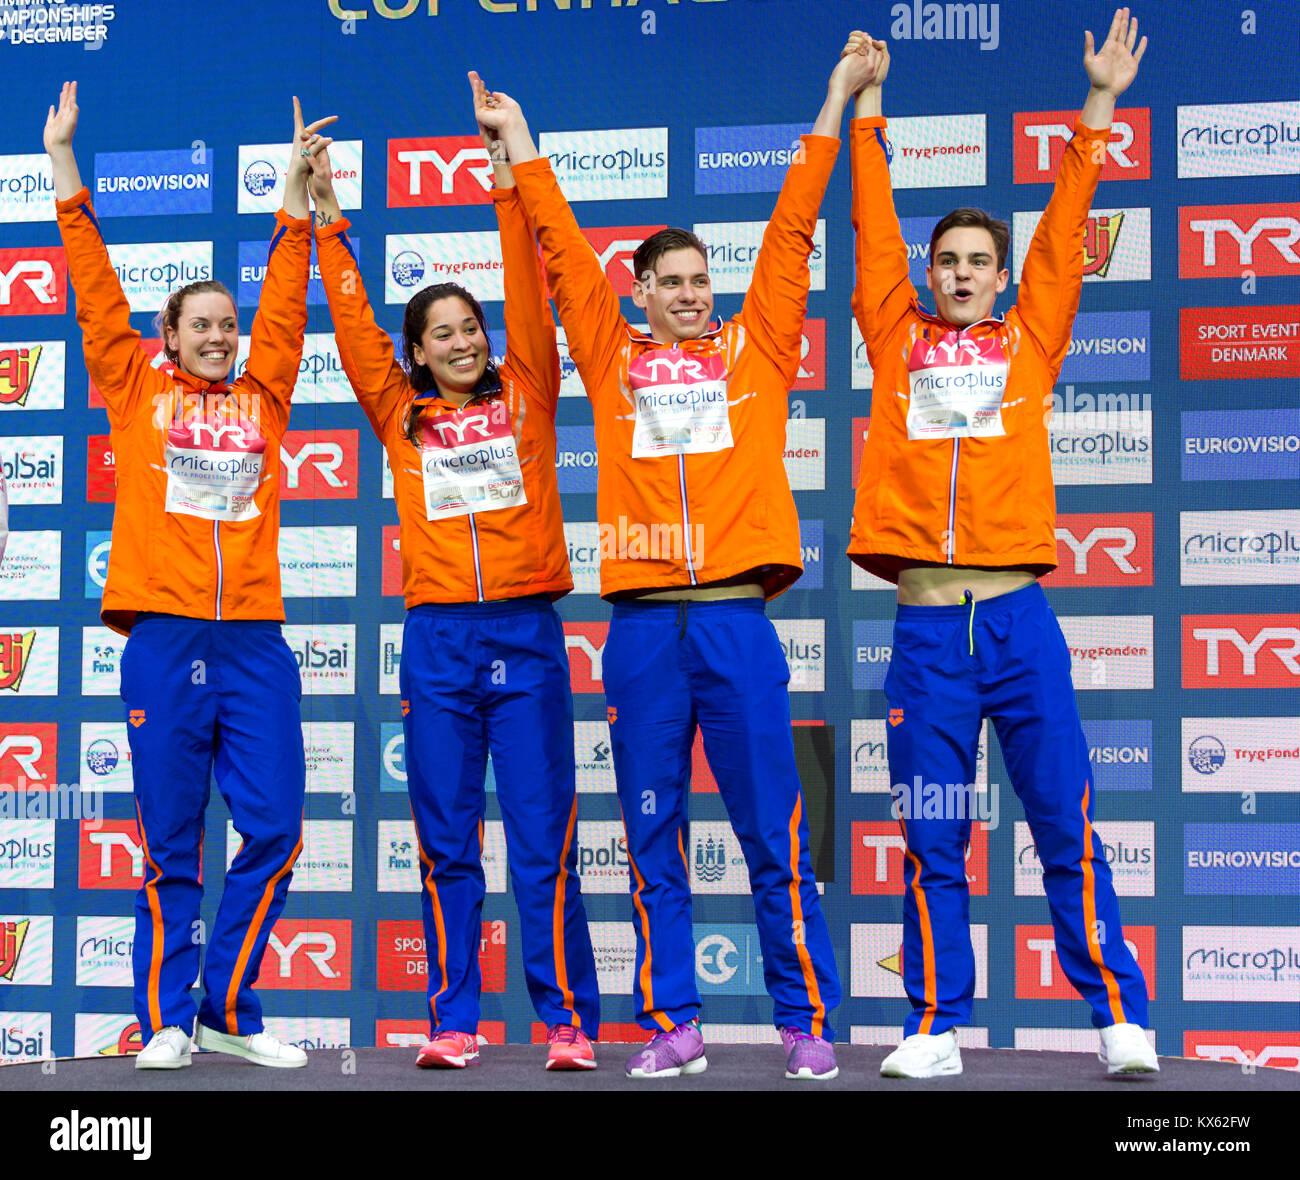 Femke HEEMSKERK, Ranomi KROMOWIDJOJO, Kyle STOLK Nyls,  KORSTANJE NED  gold  Medal  4x100 Freestyle Mixed Relay - Stock Image